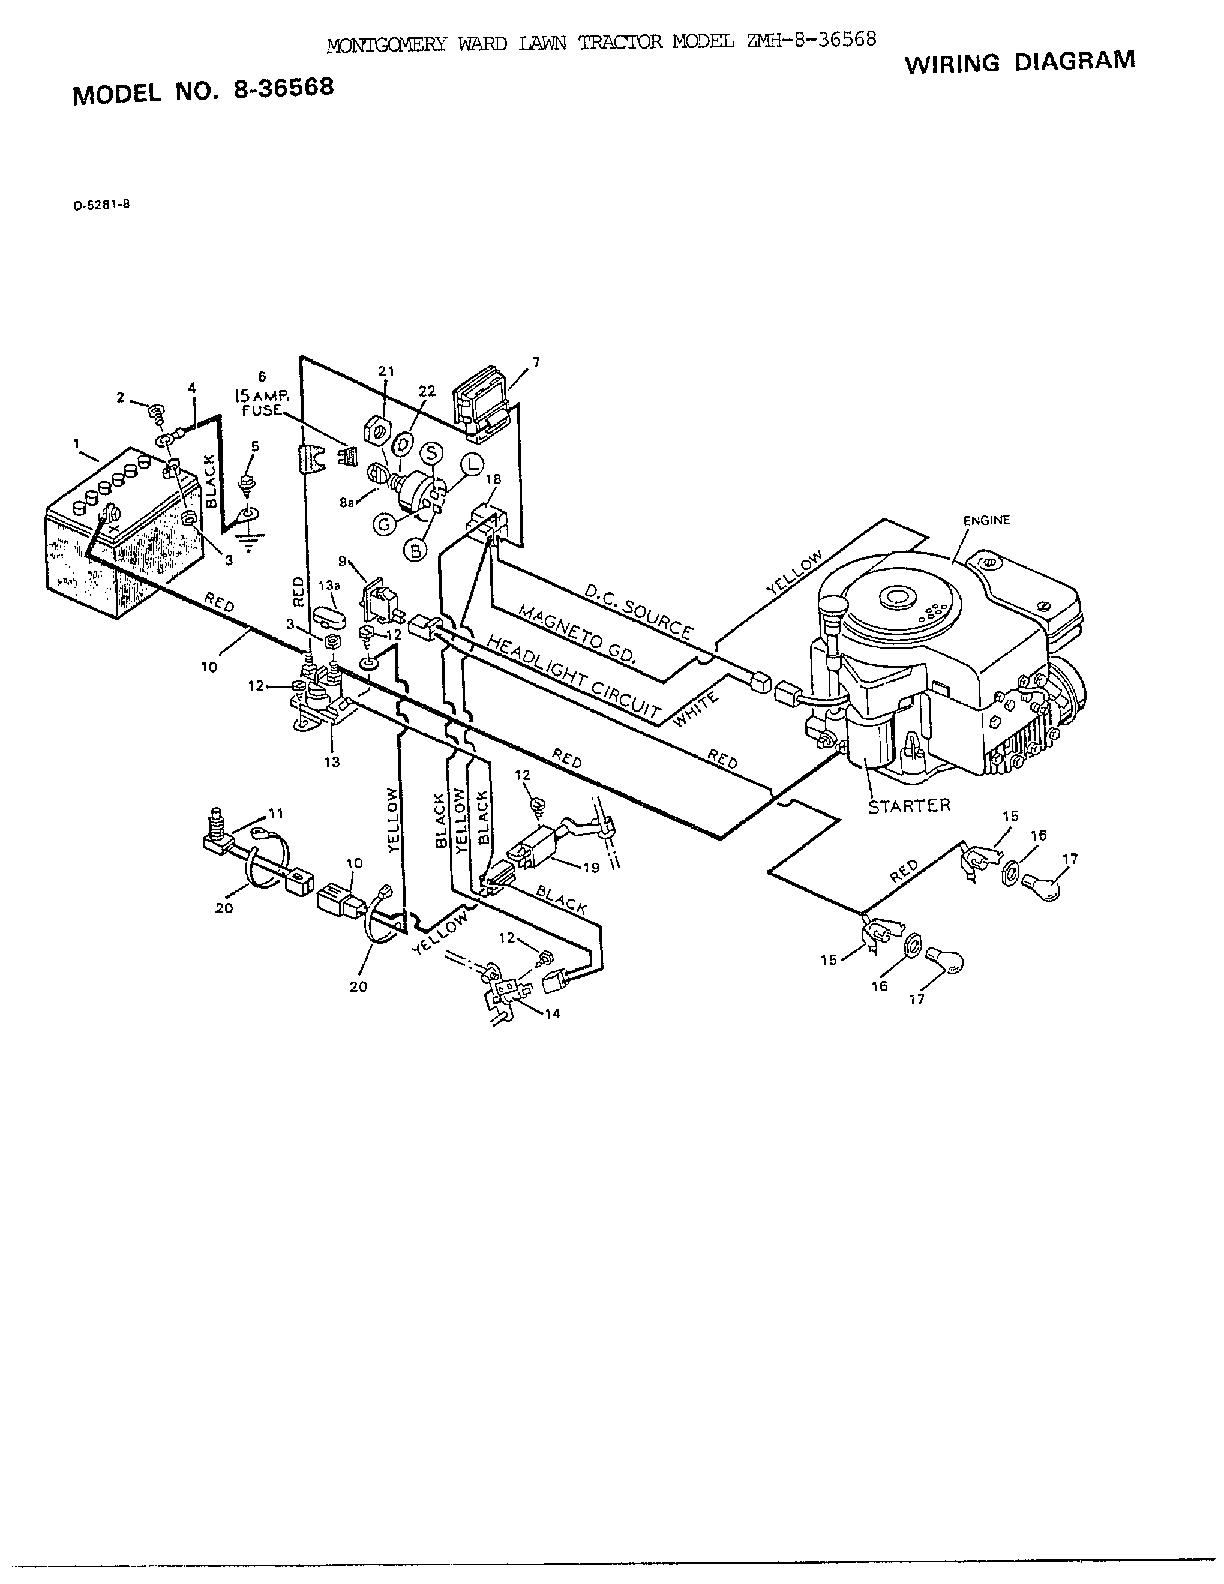 8 Hp Briggs And Stratton Wiring Diagram. . Wiring Diagram Manitowoc Qm Wiring Diagram on